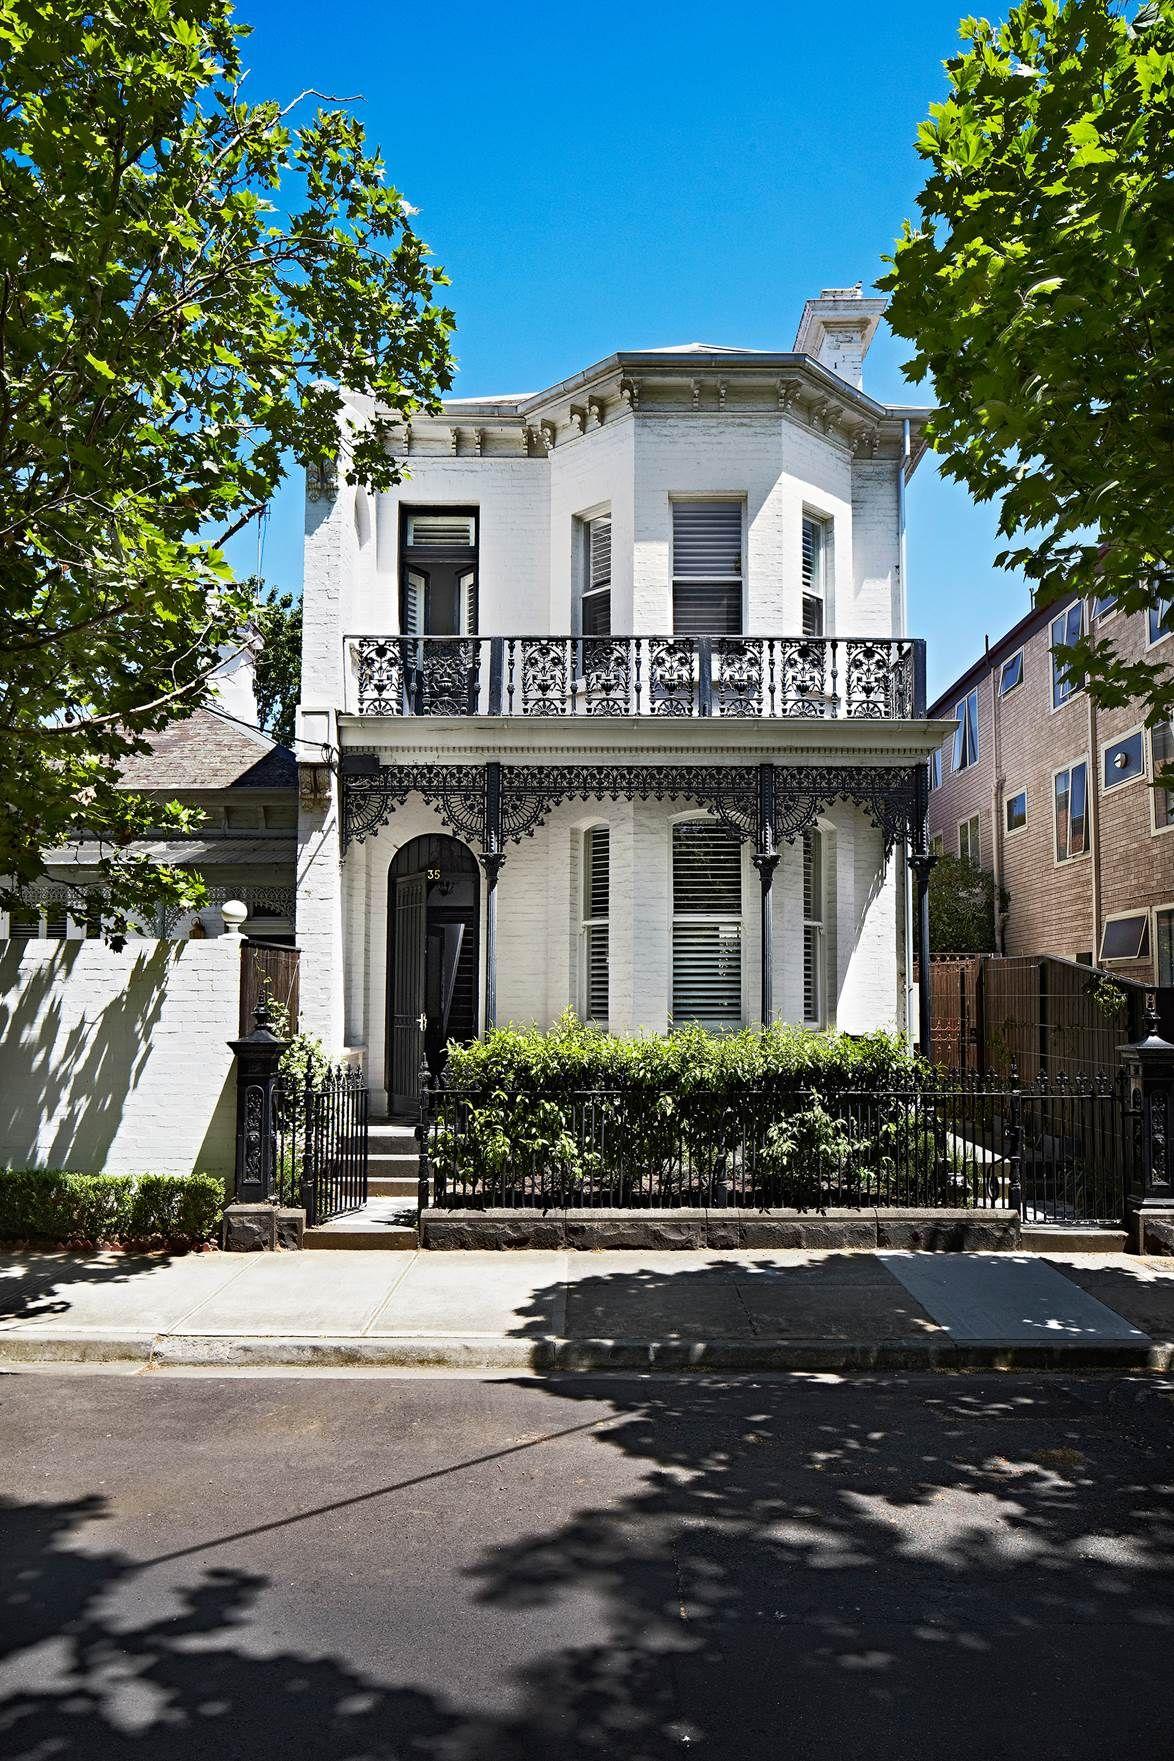 Melbourne Apartments Converted Into Family Home Townhouse Exterior Terrace House Exterior Facade House